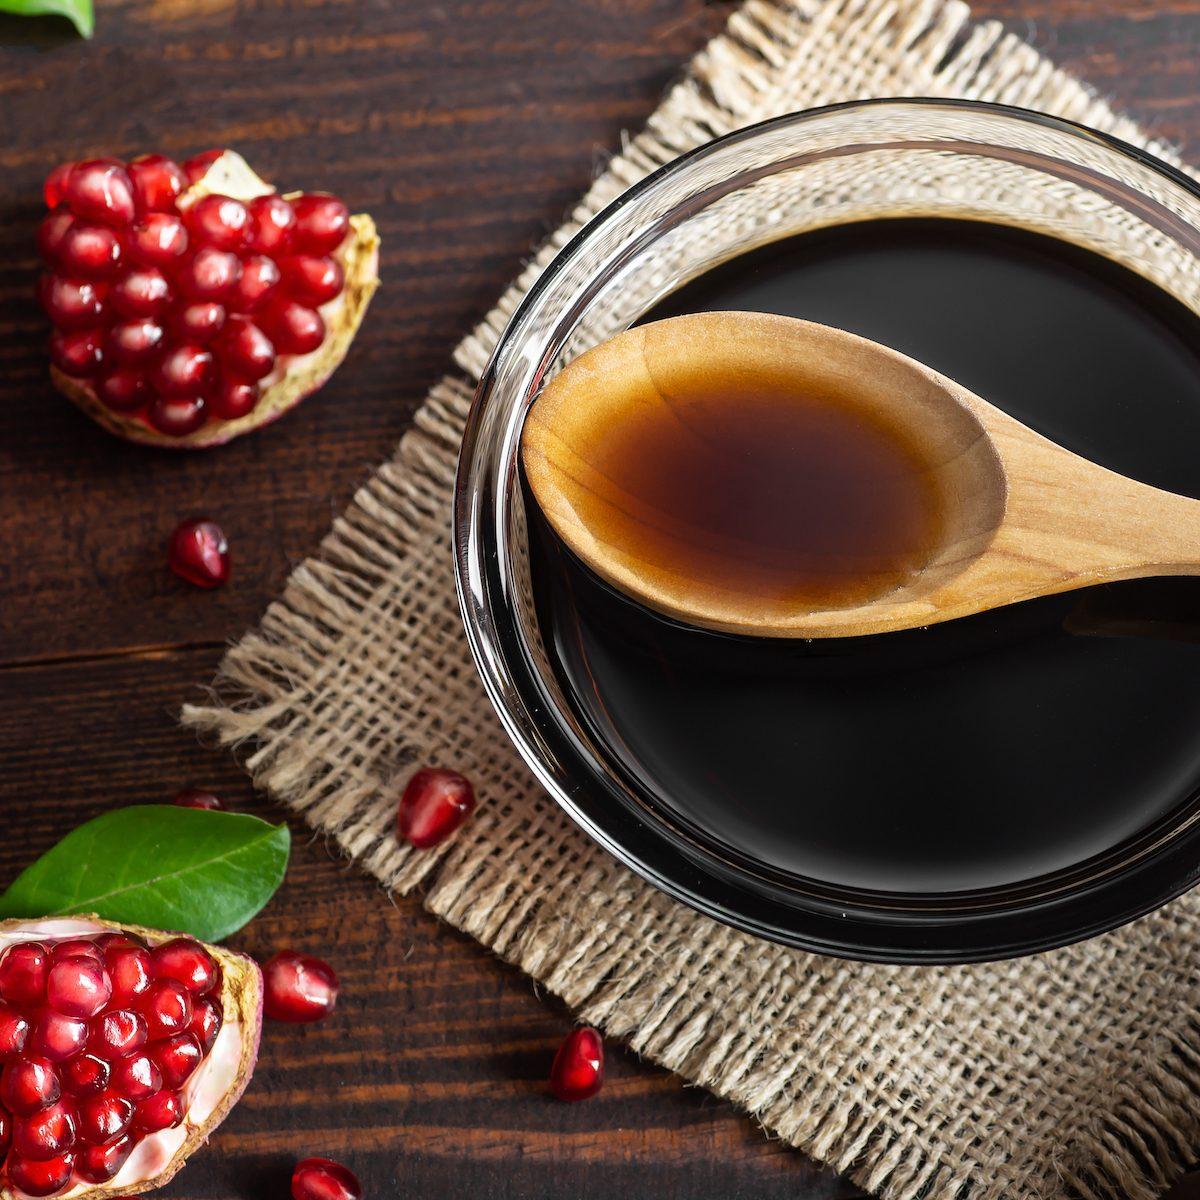 Pomegranate molasses in a glass bowl.